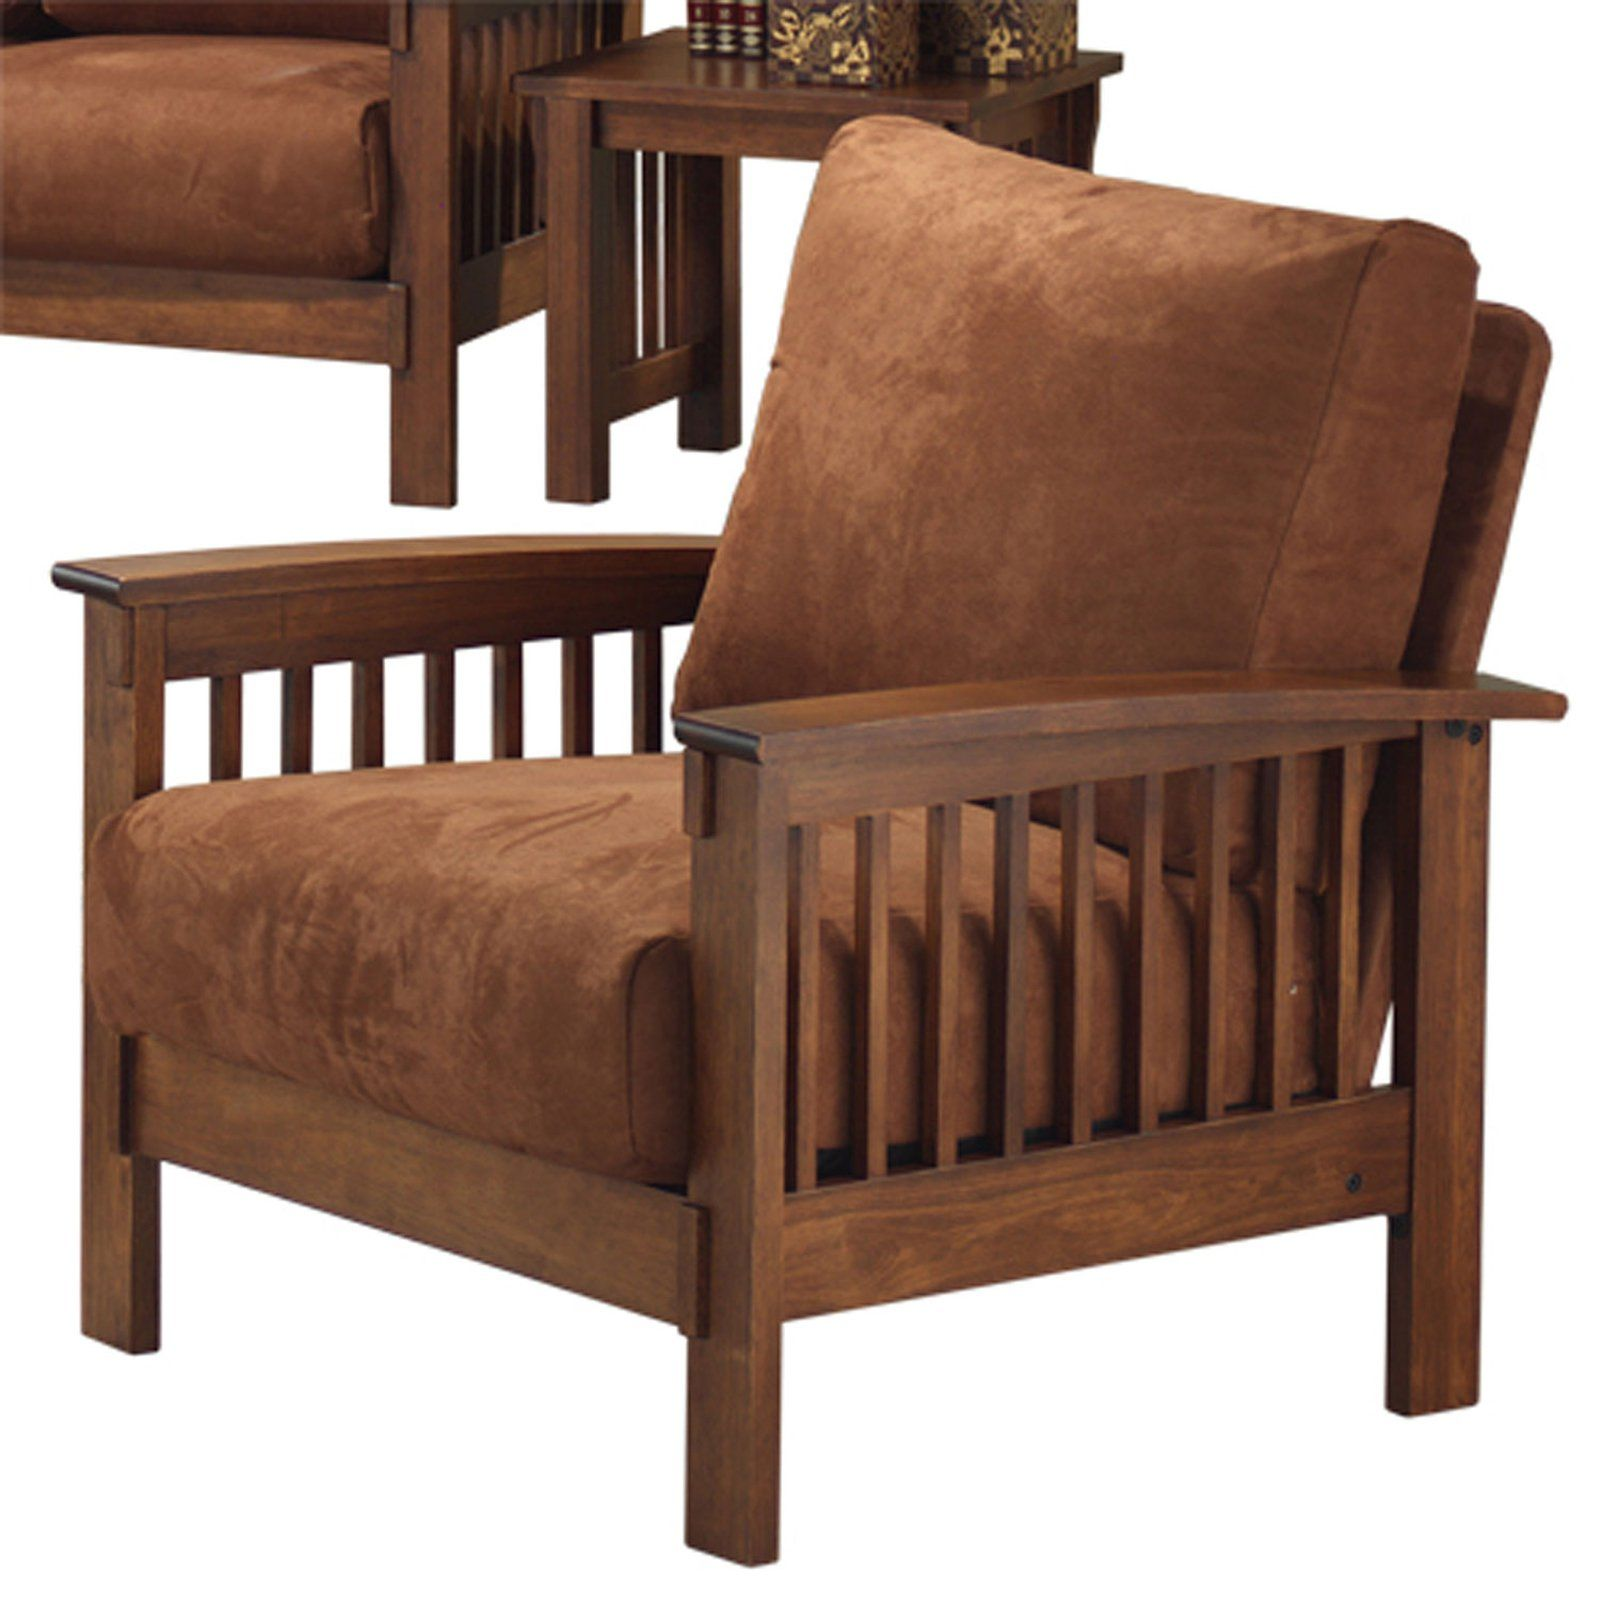 Weston Home Monterey Chair In 2019